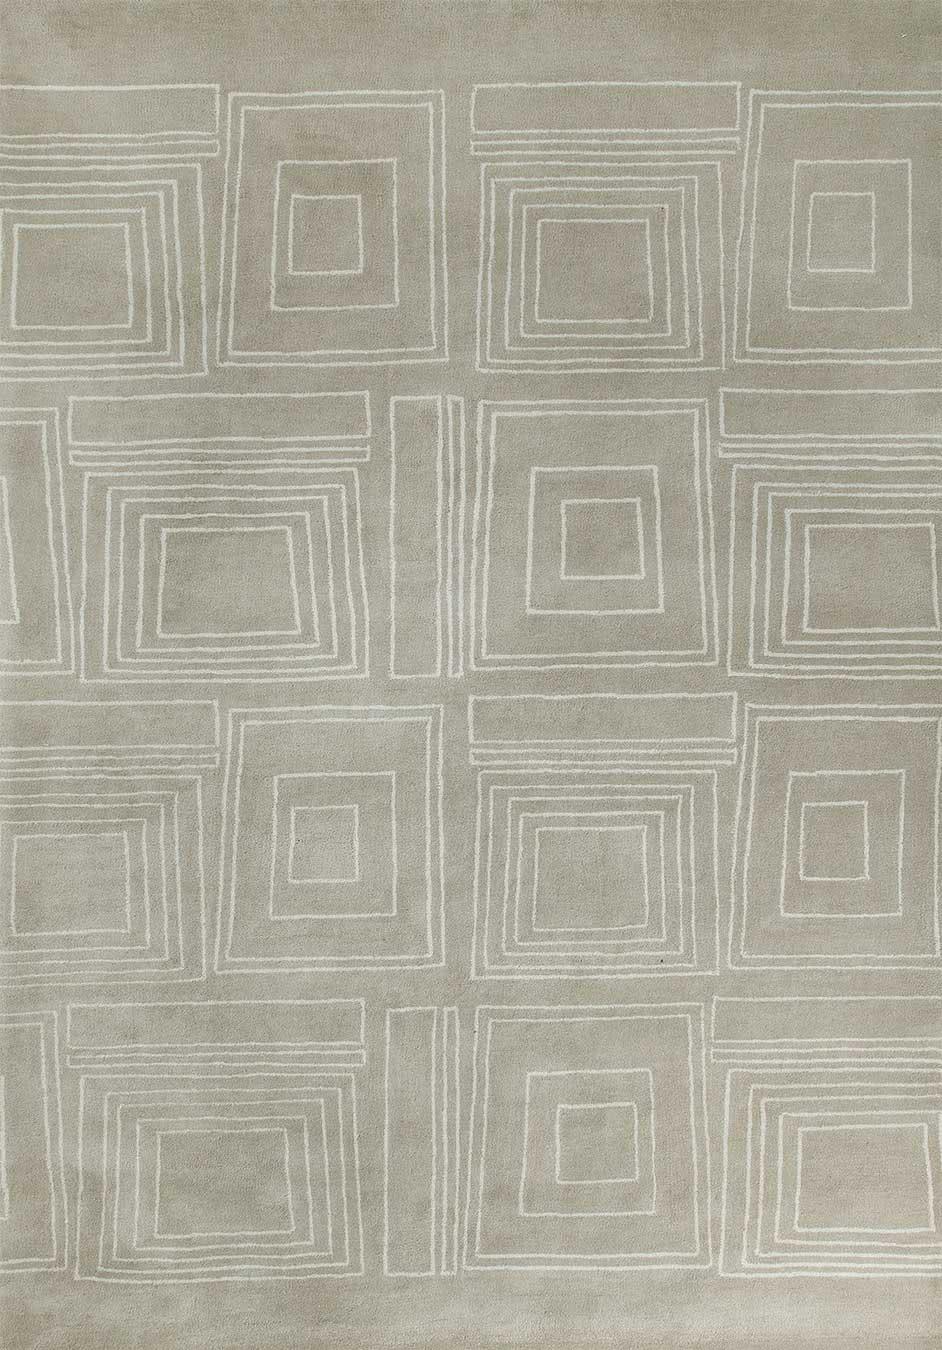 Frames rug in Sandstone colourway overhead image